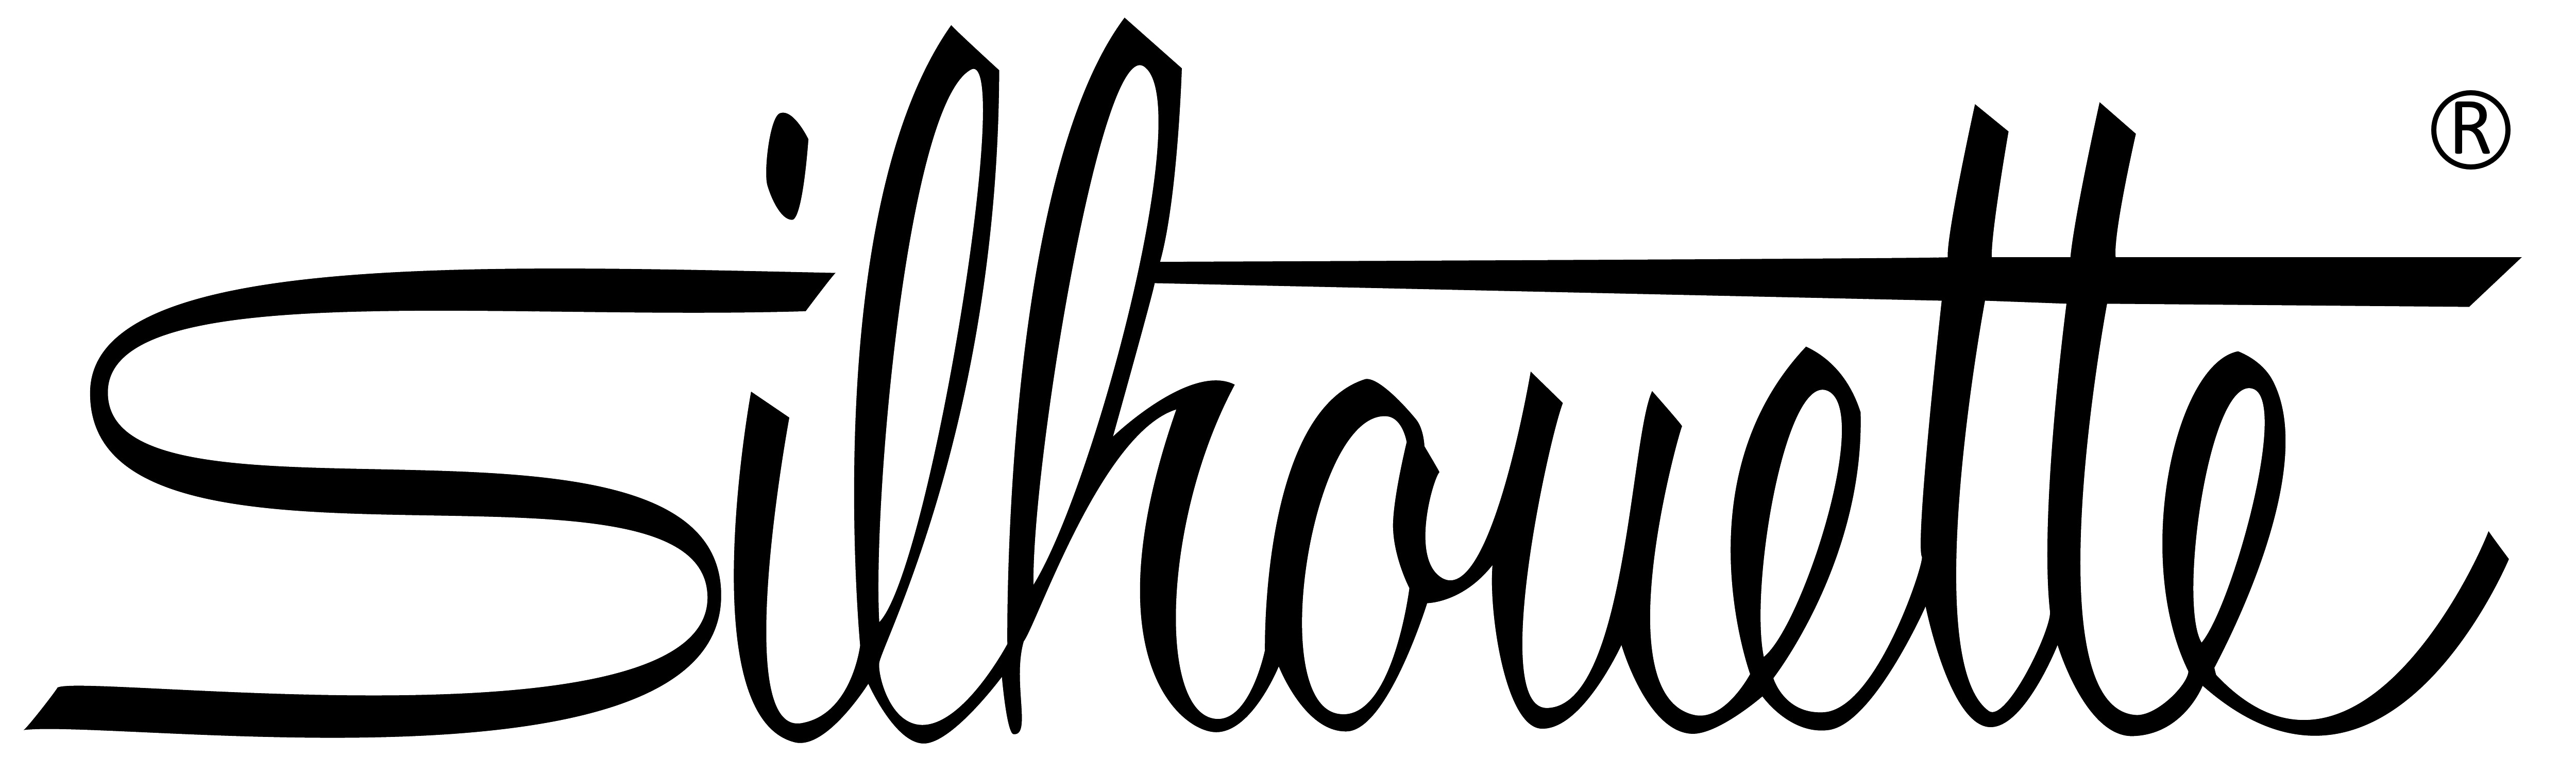 silhouette_logo_logotype